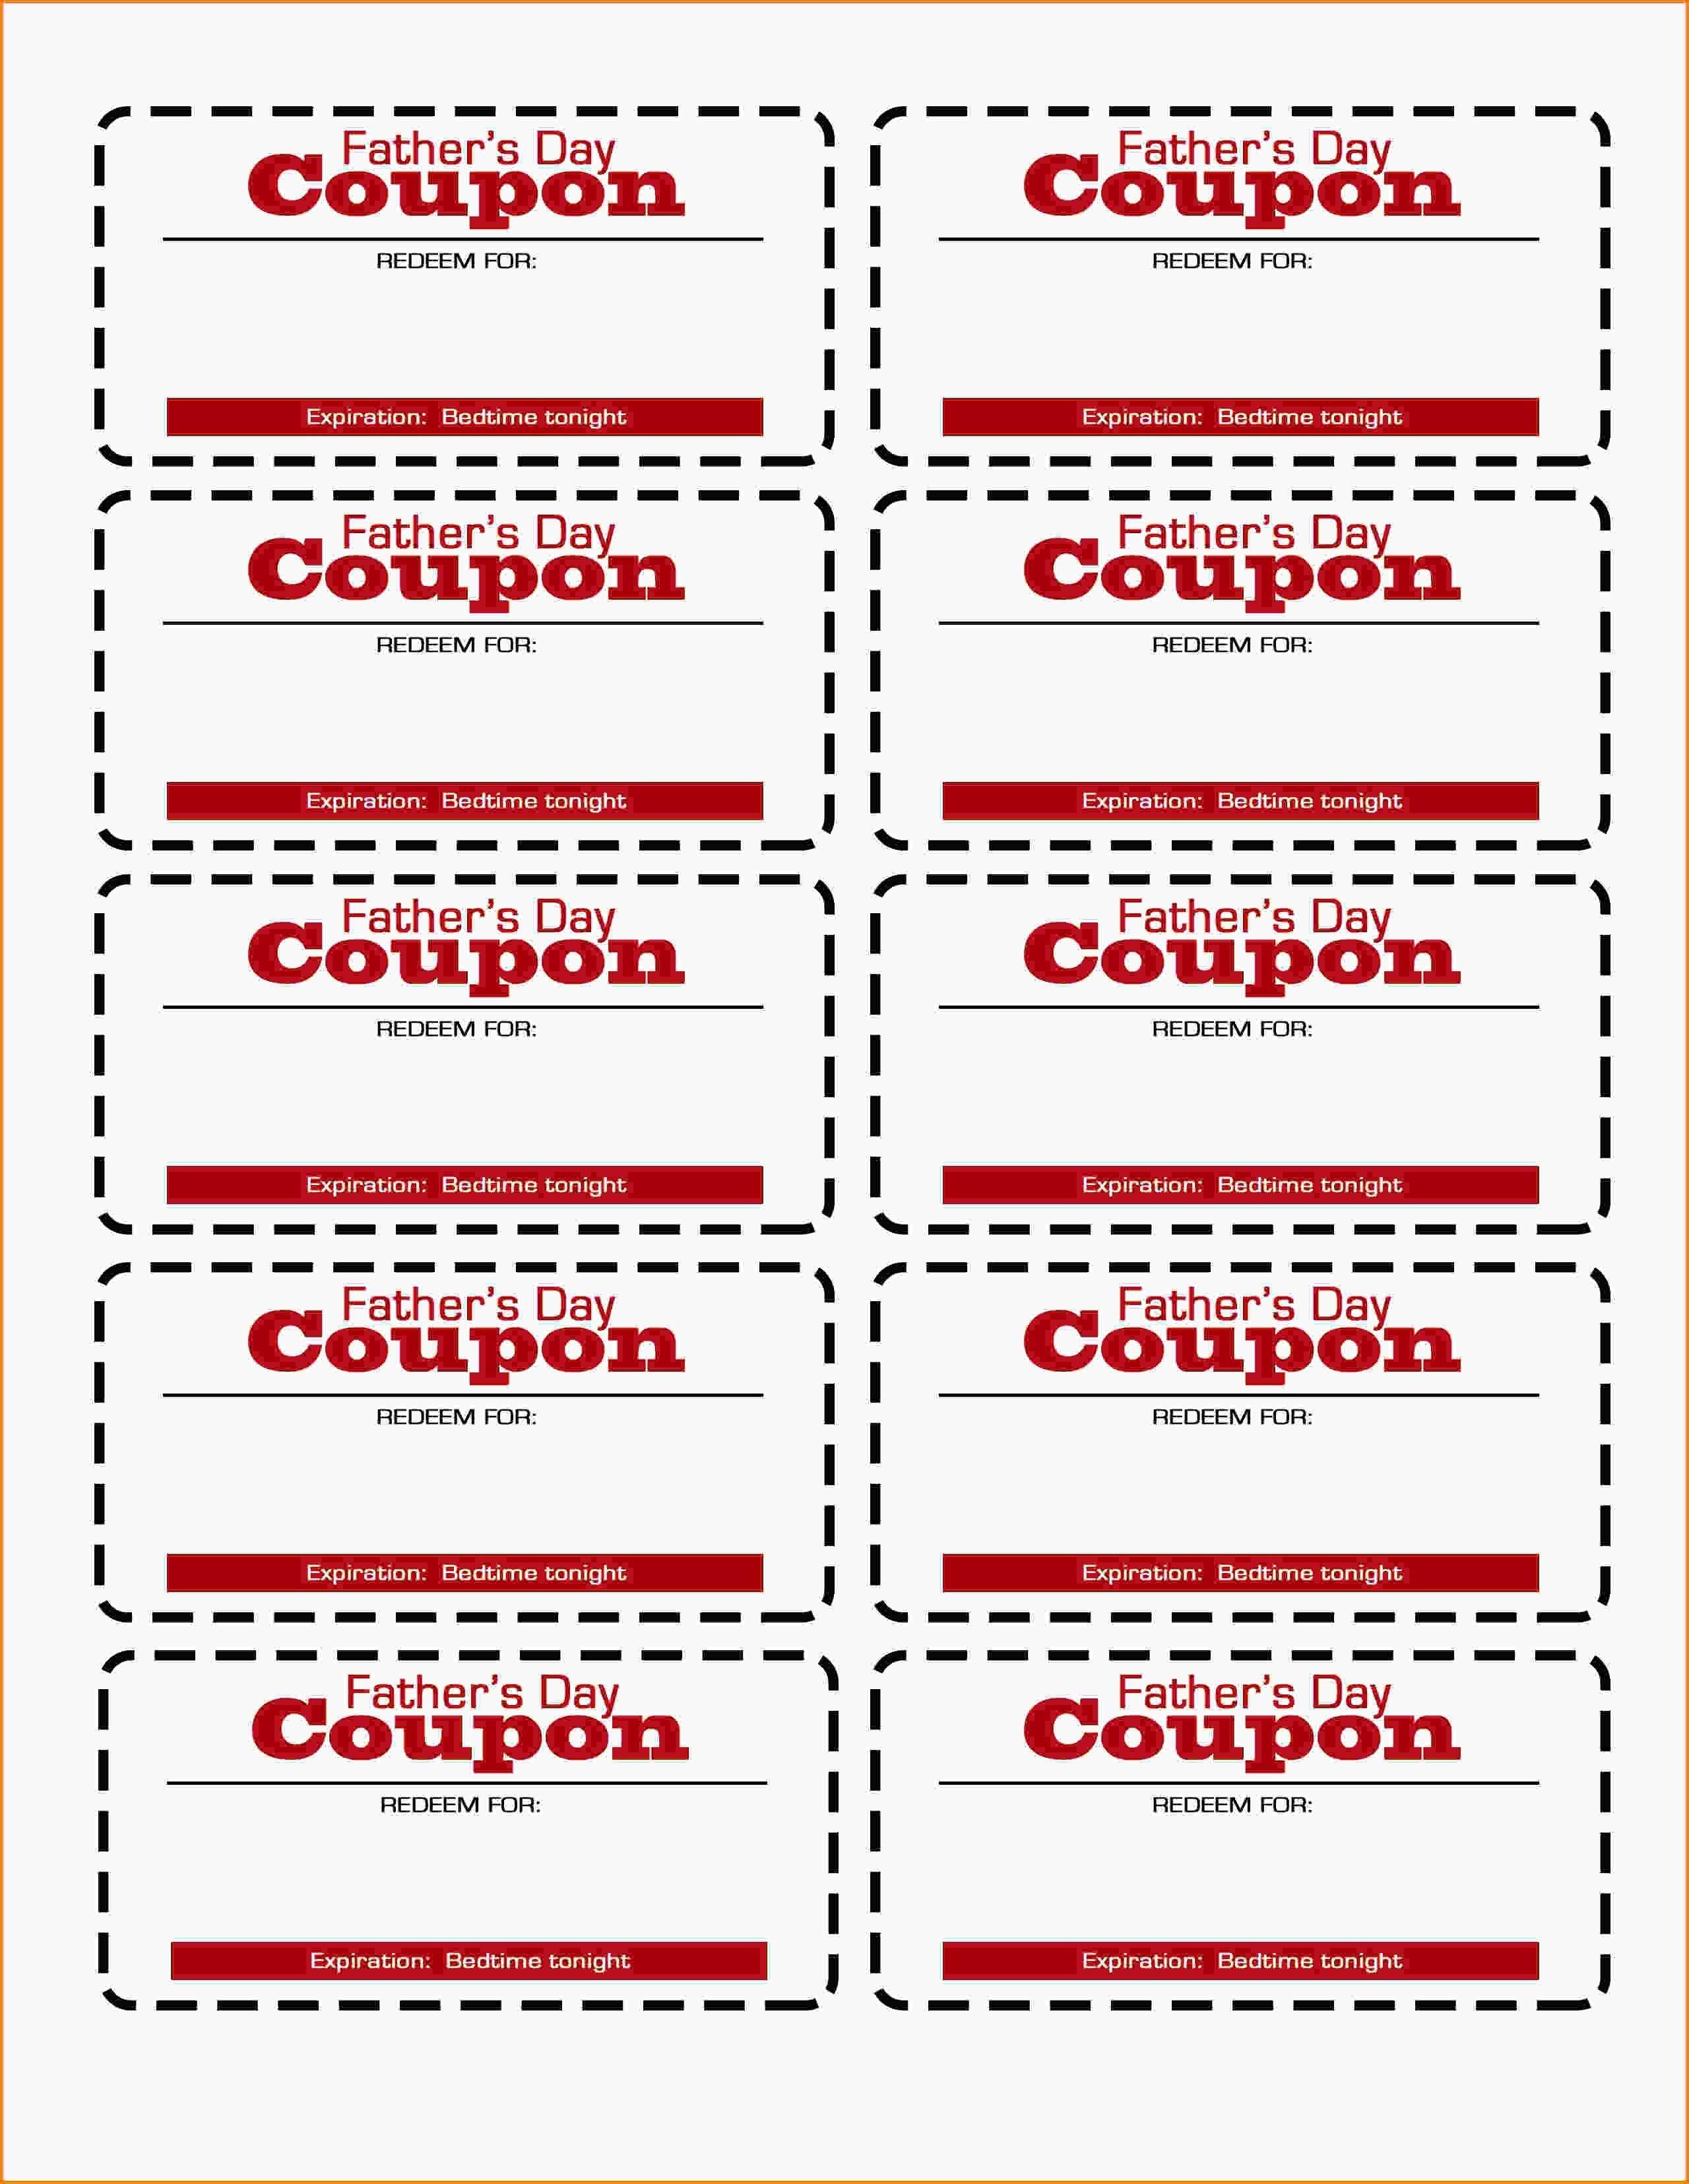 Father's Day Coupon Printable! | Flourish | Free Resources For Pro - Free Printable Coupon Templates